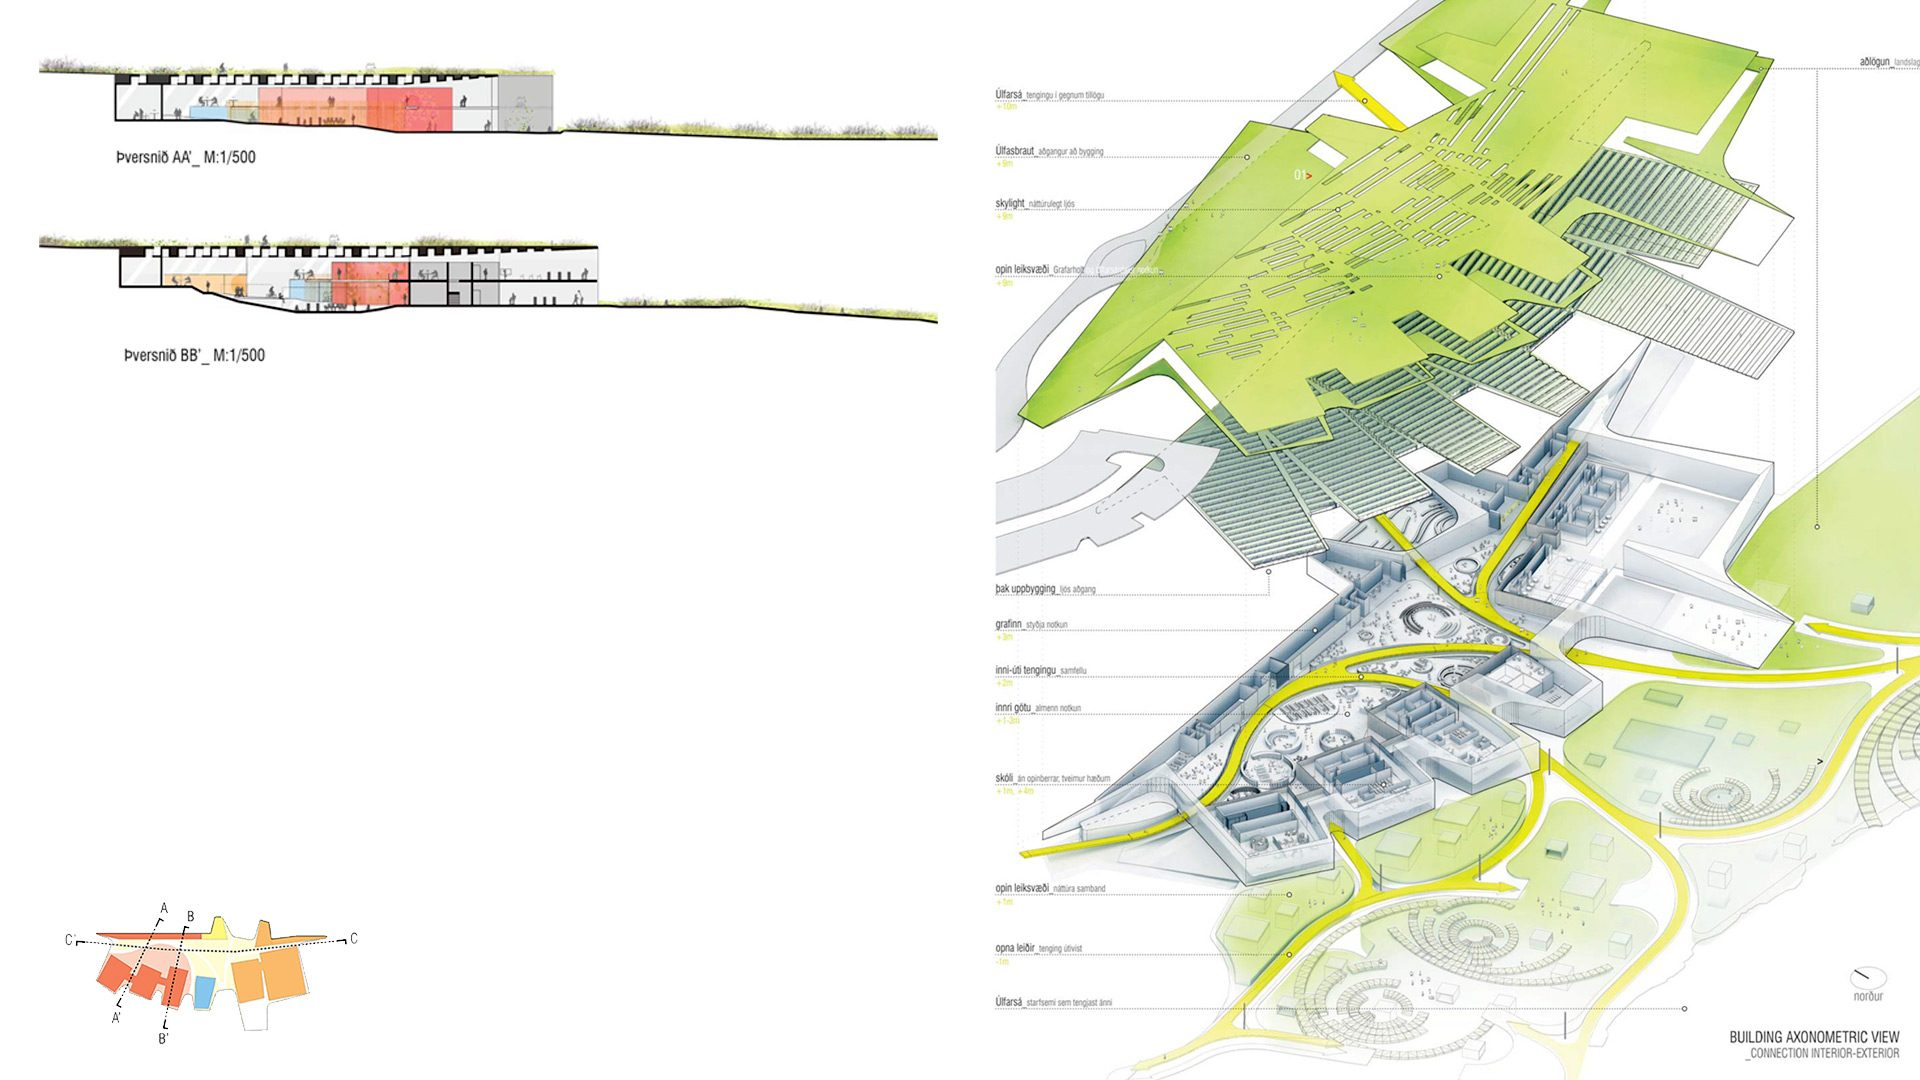 01_Building-Axonometric-View